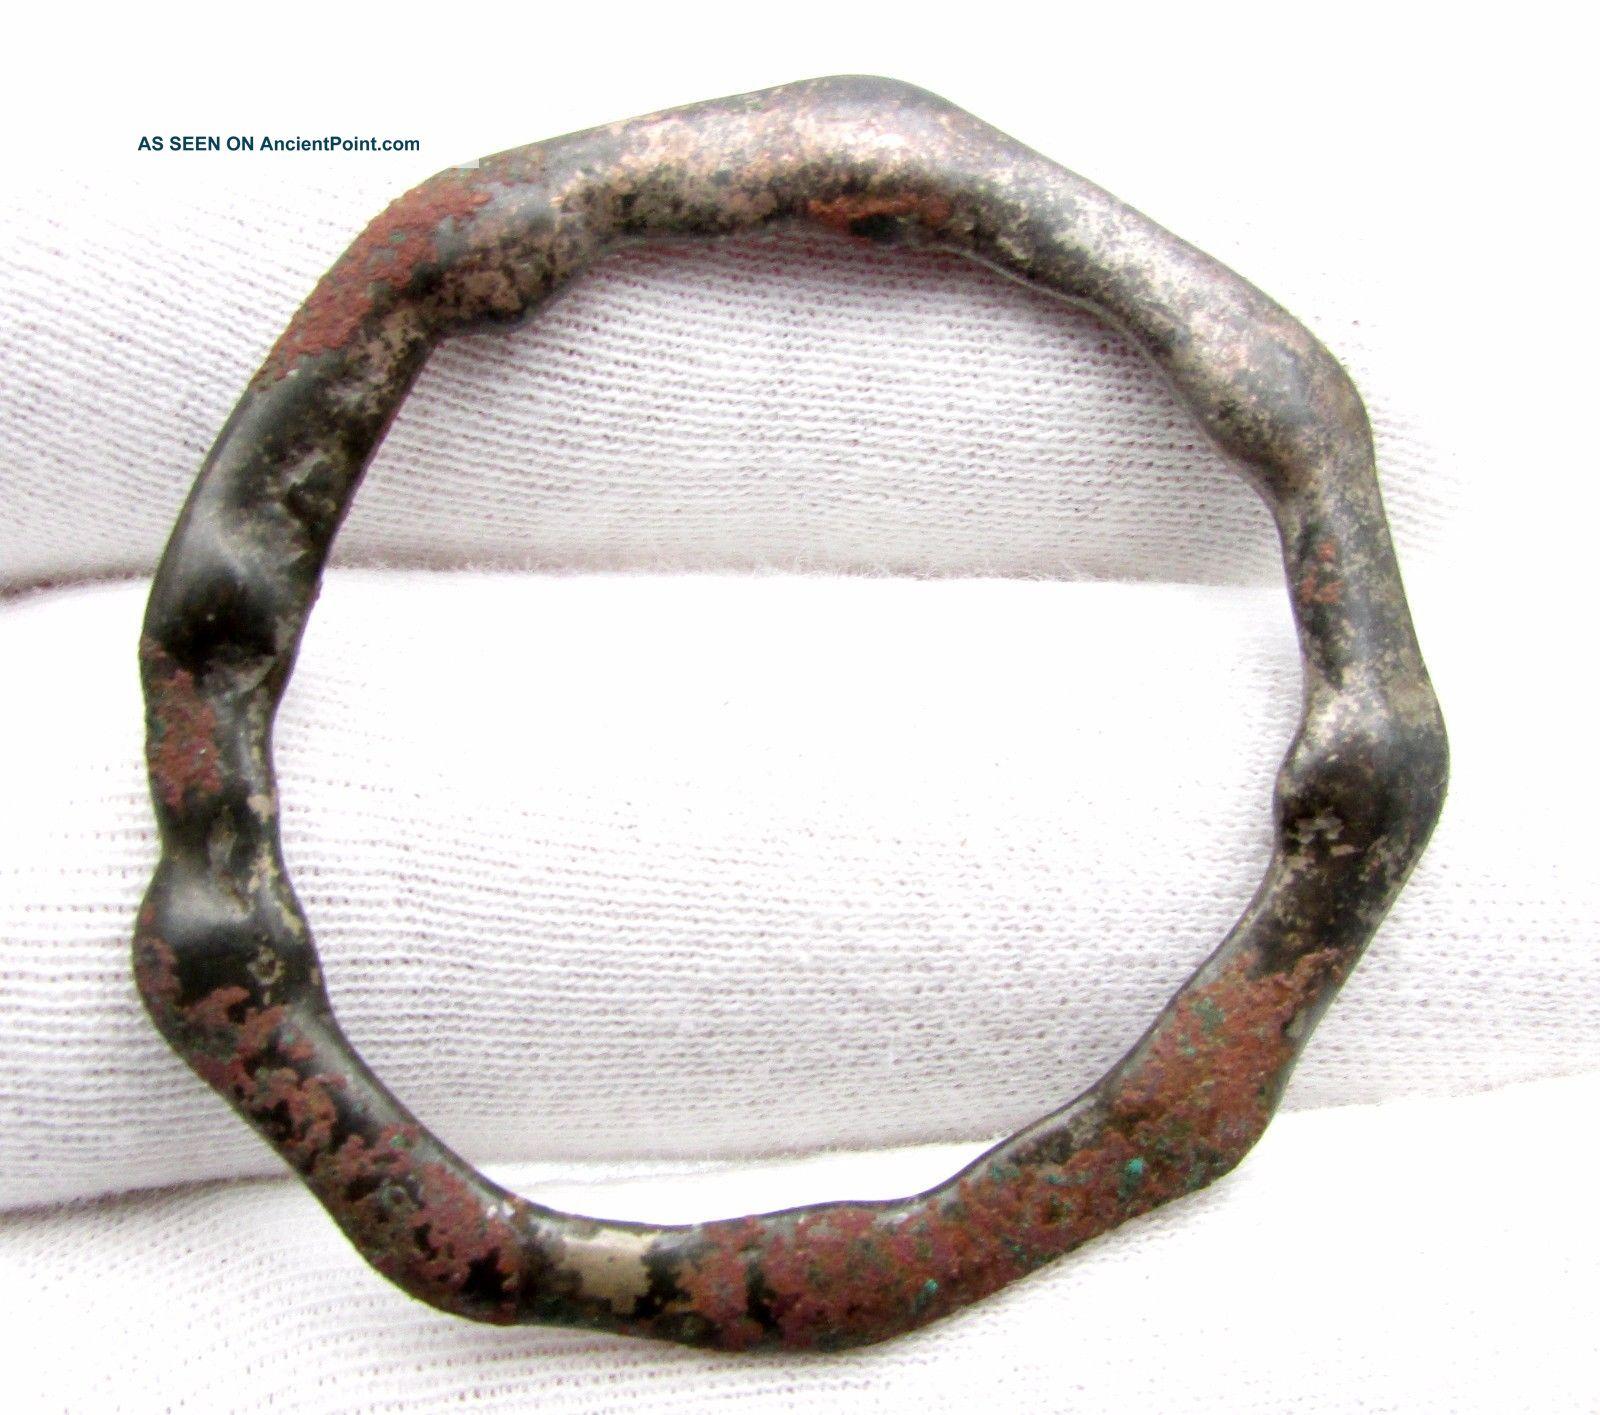 Celtic Bronze Sun Amulet Decorated - Rare Ancient Wearable Artifact - C428 Roman photo